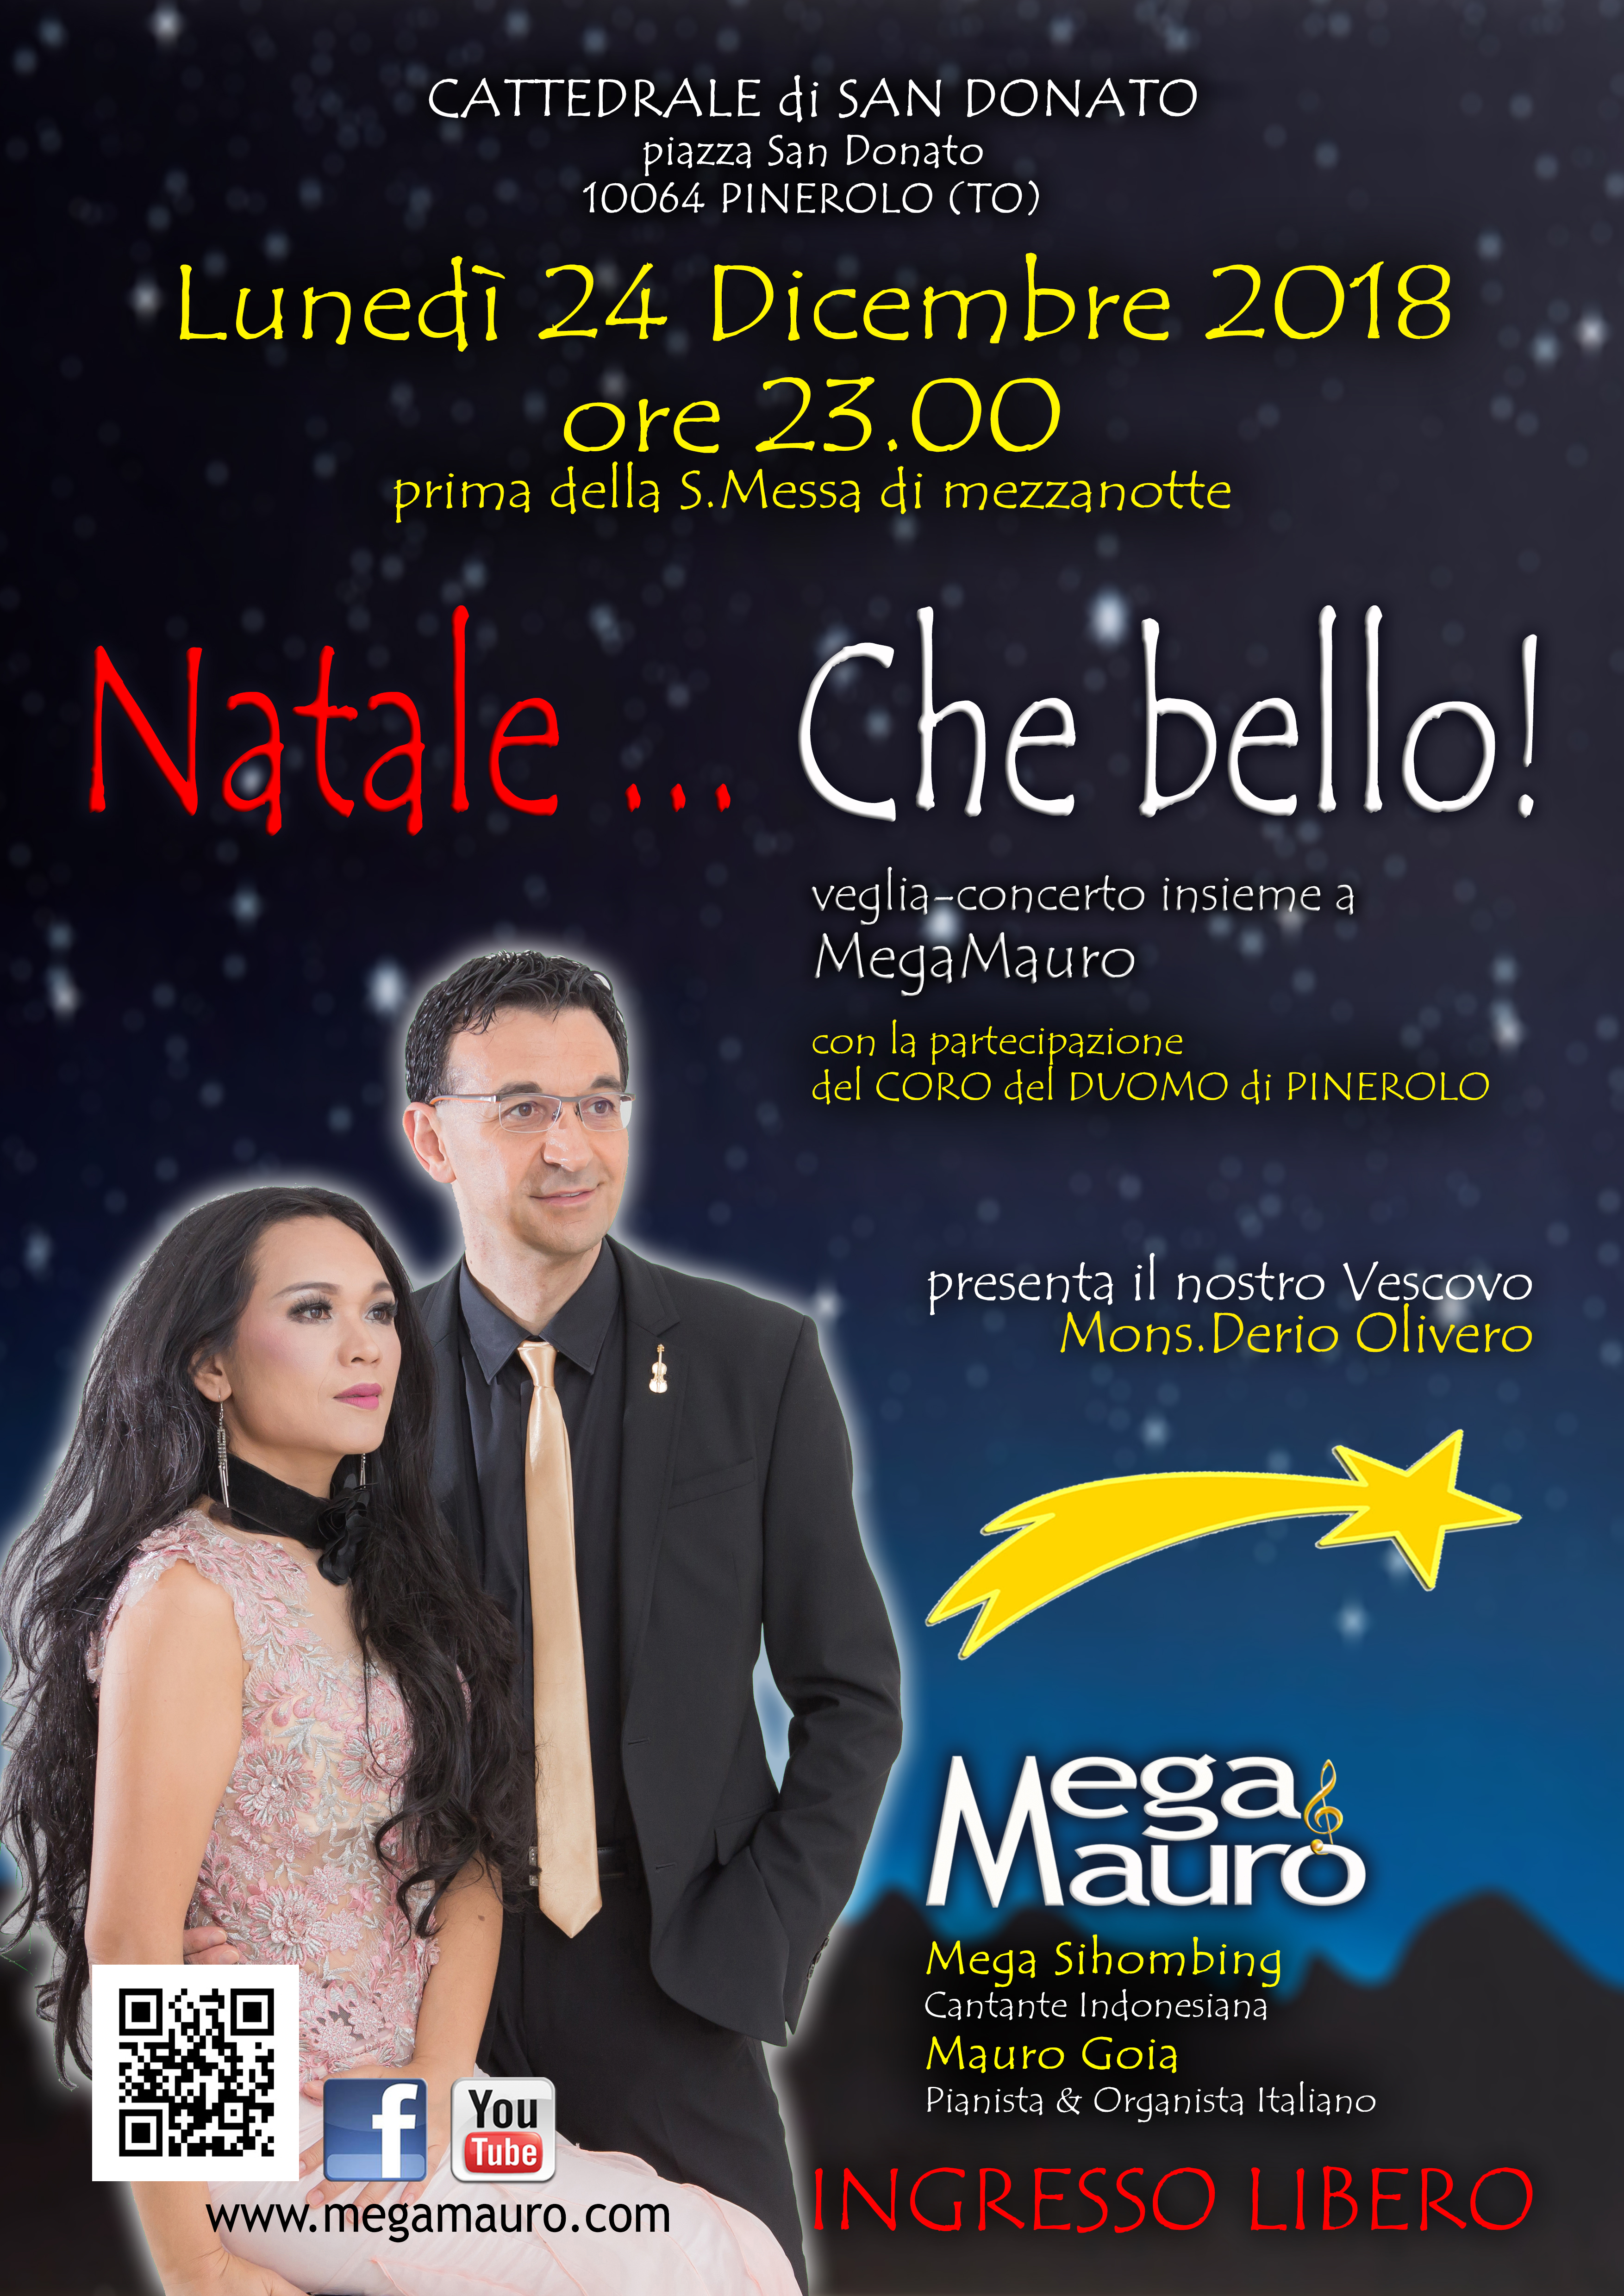 PINEROLO - Italy